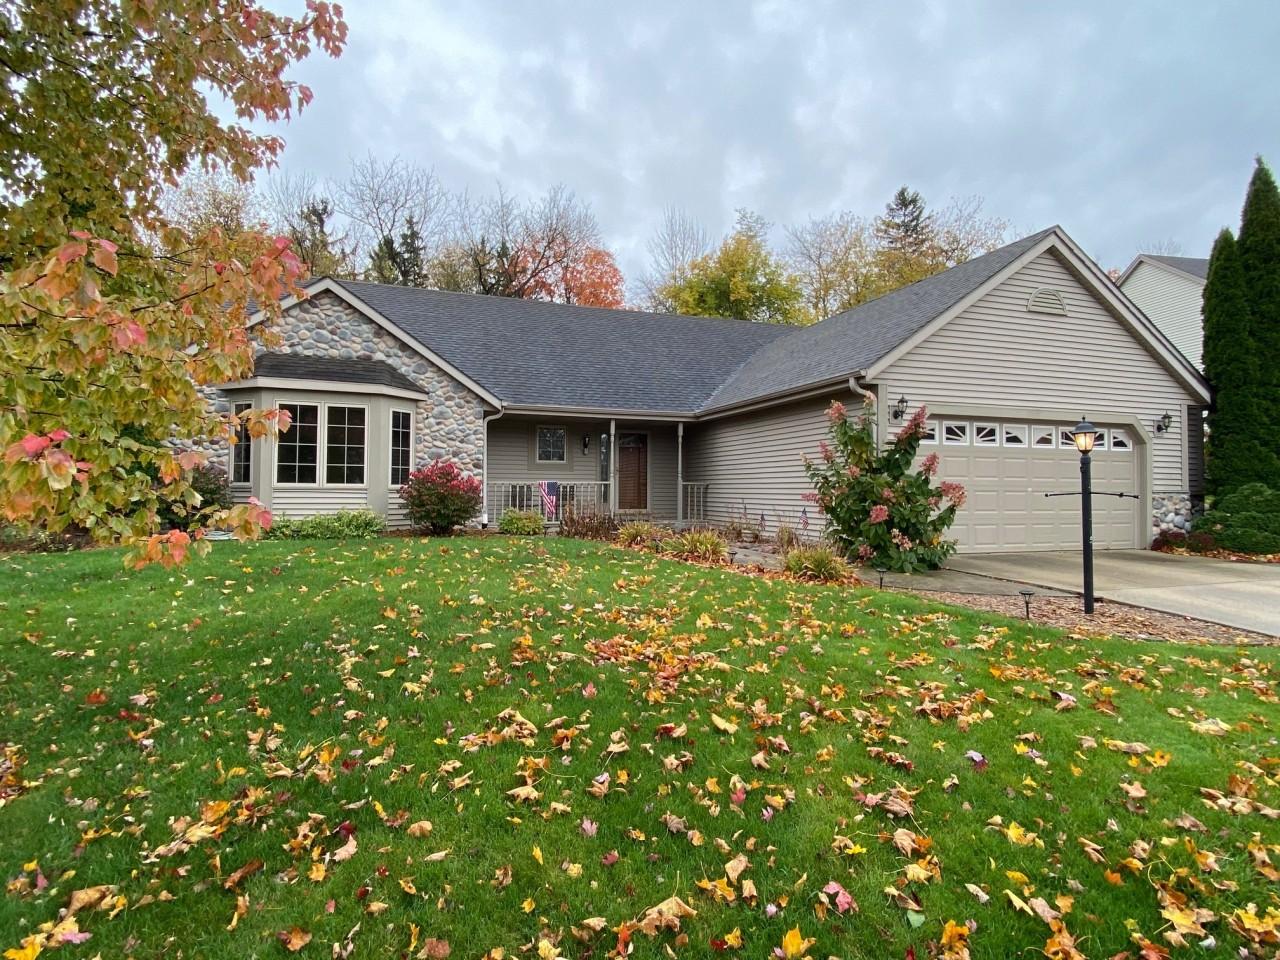 371 Yosemite Rd, Oconomowoc, Wisconsin 53066, 3 Bedrooms Bedrooms, 6 Rooms Rooms,2 BathroomsBathrooms,Single-Family,For Sale,Yosemite Rd,1715418